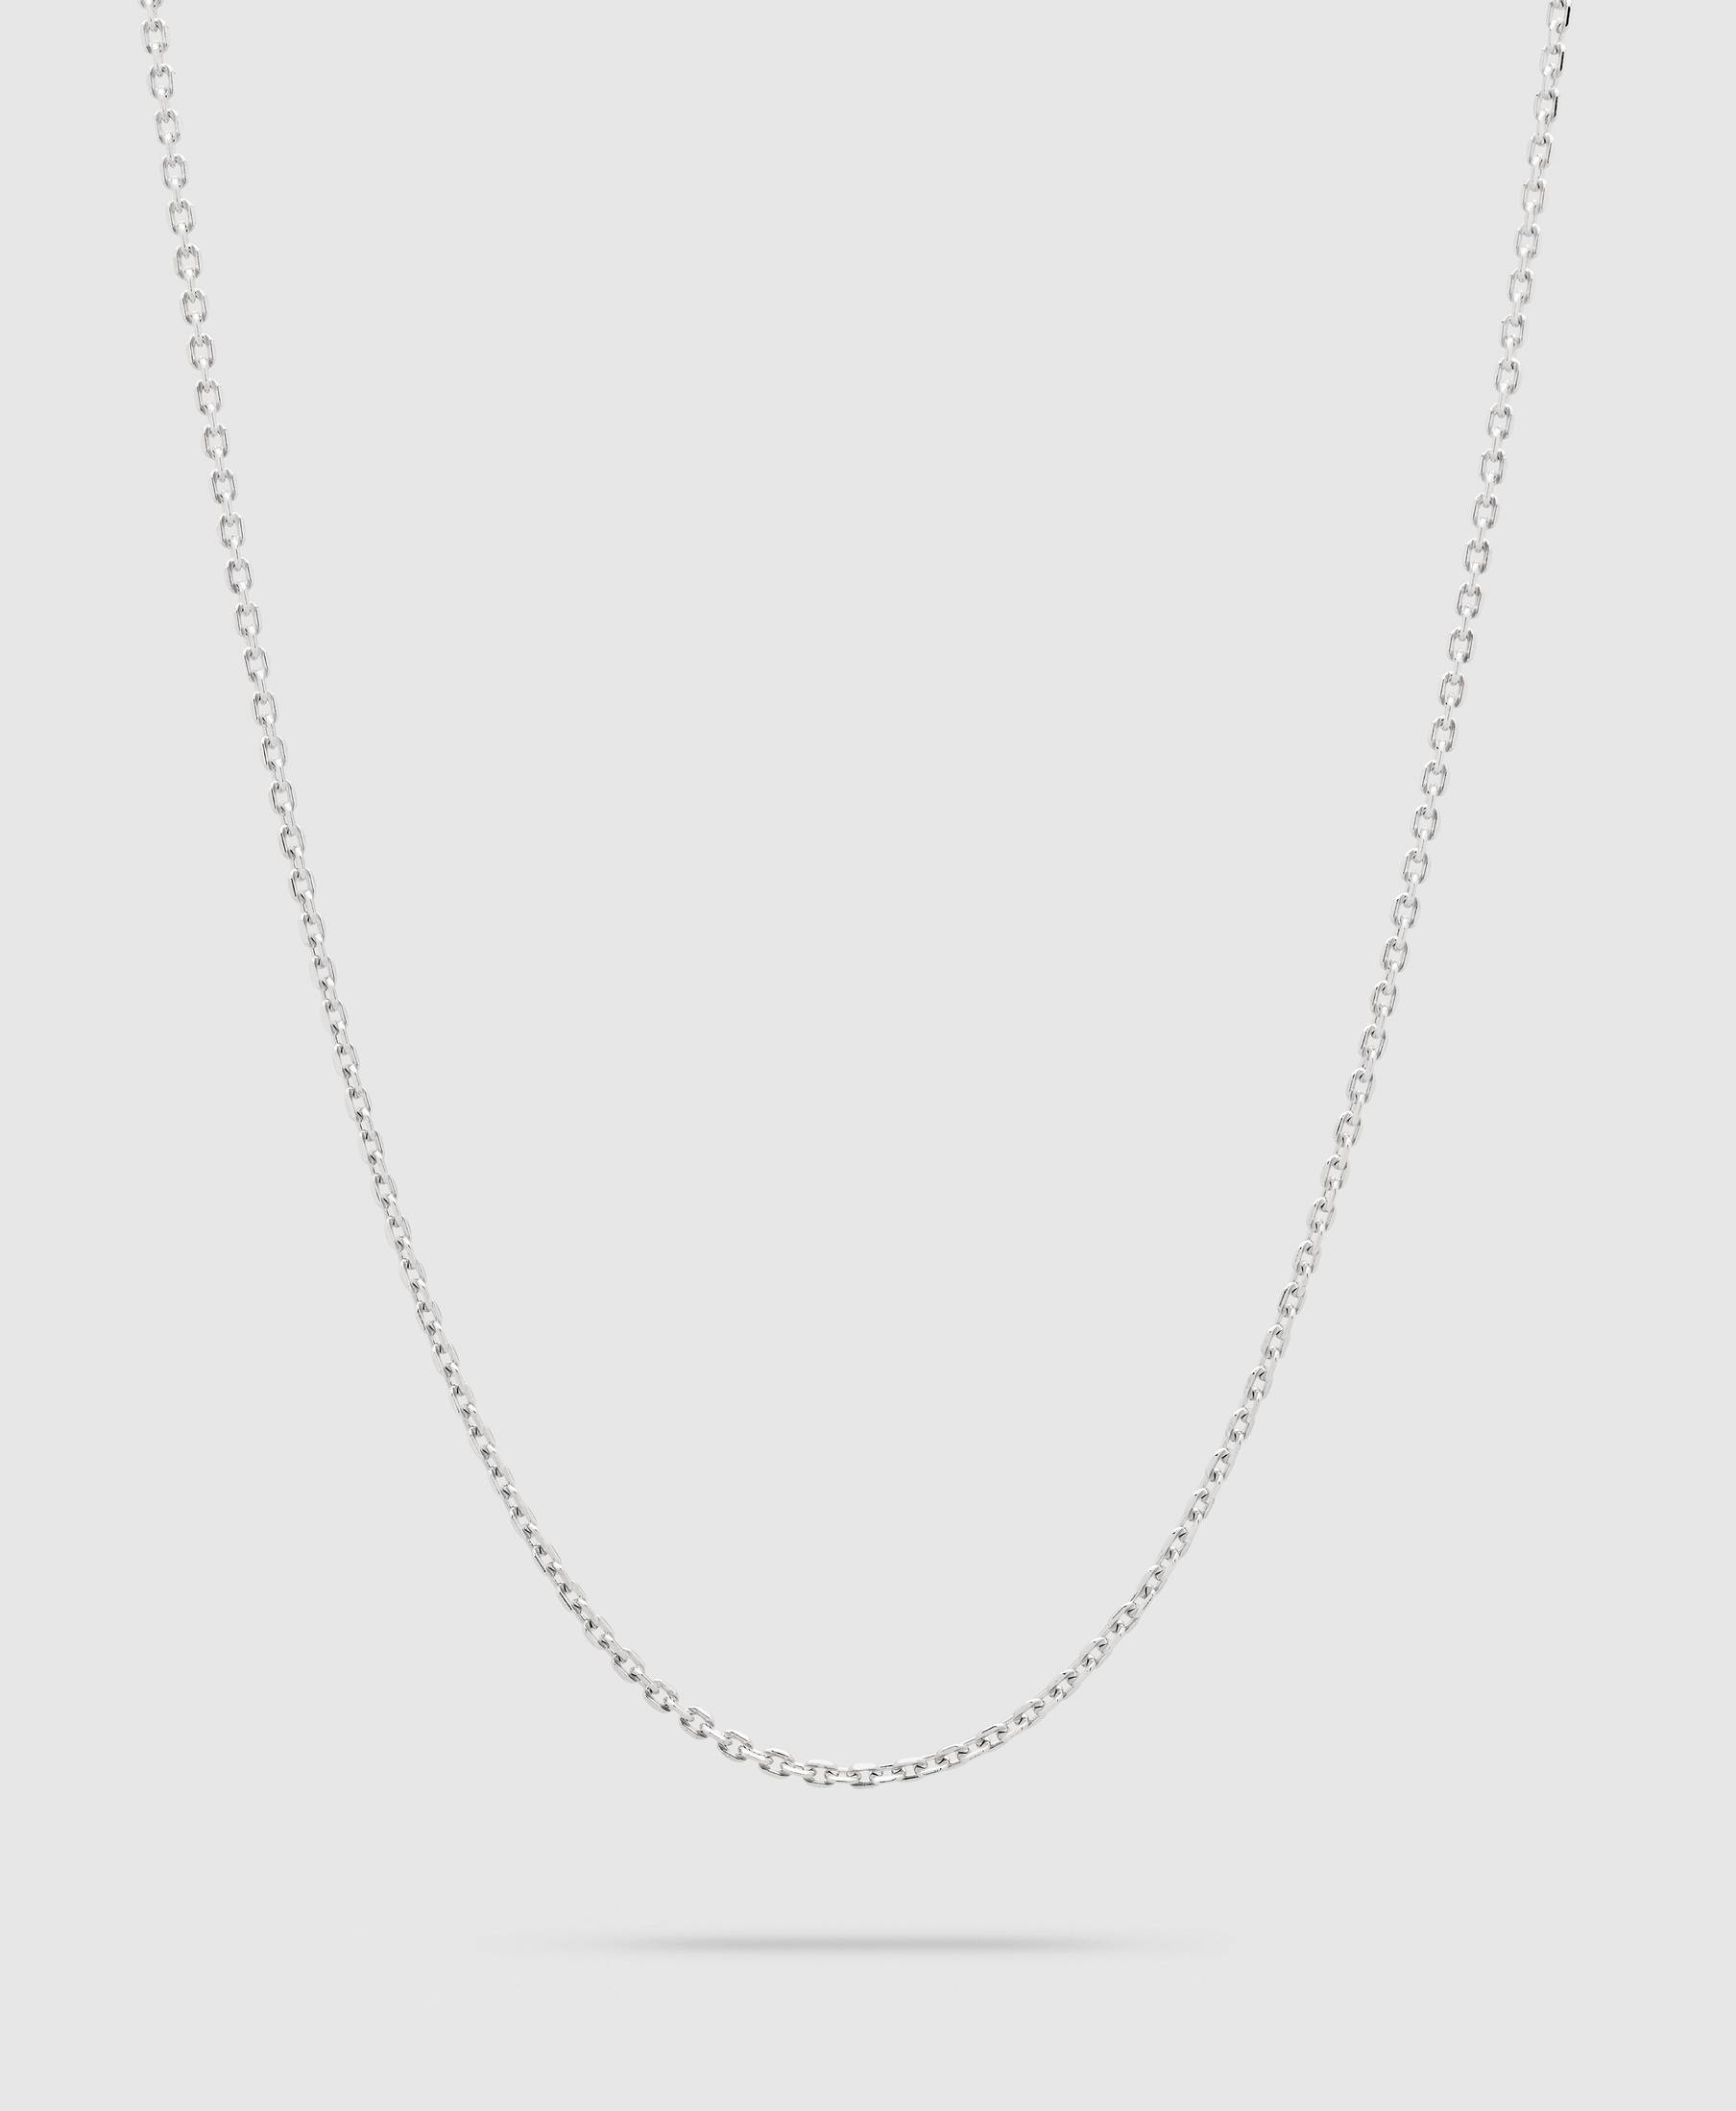 Anker Chain Slim